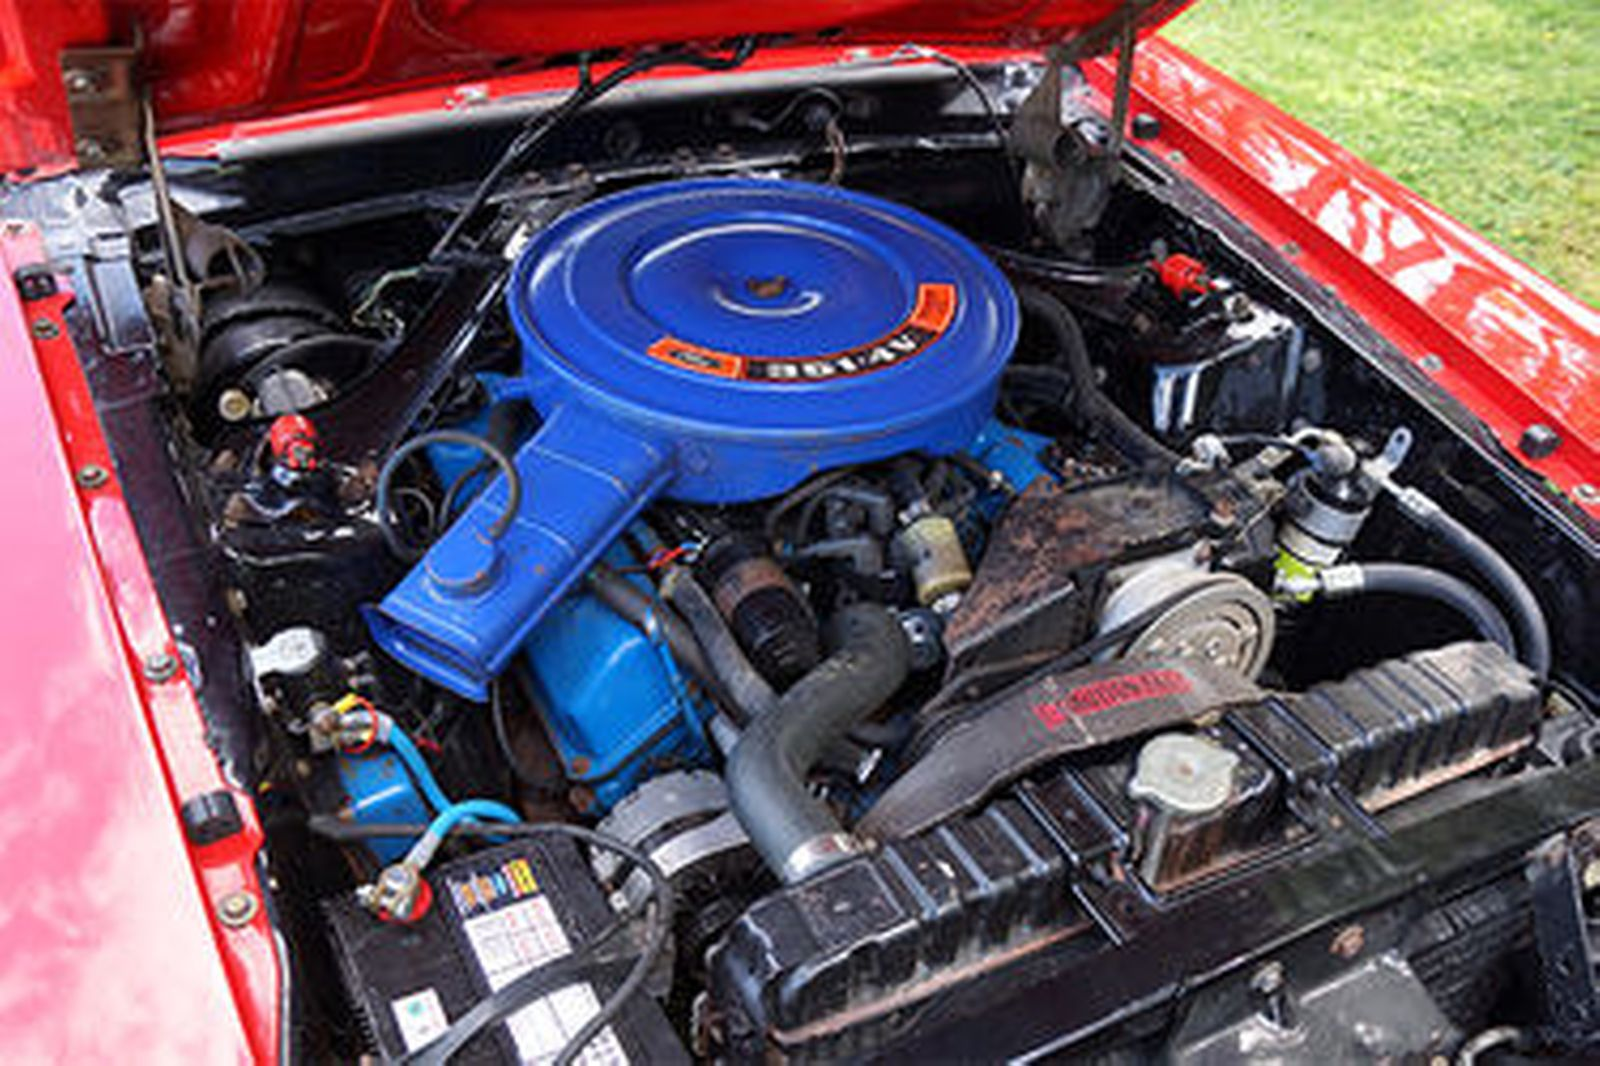 Ford Mustang Mach 1 351 Fastback (RHD)